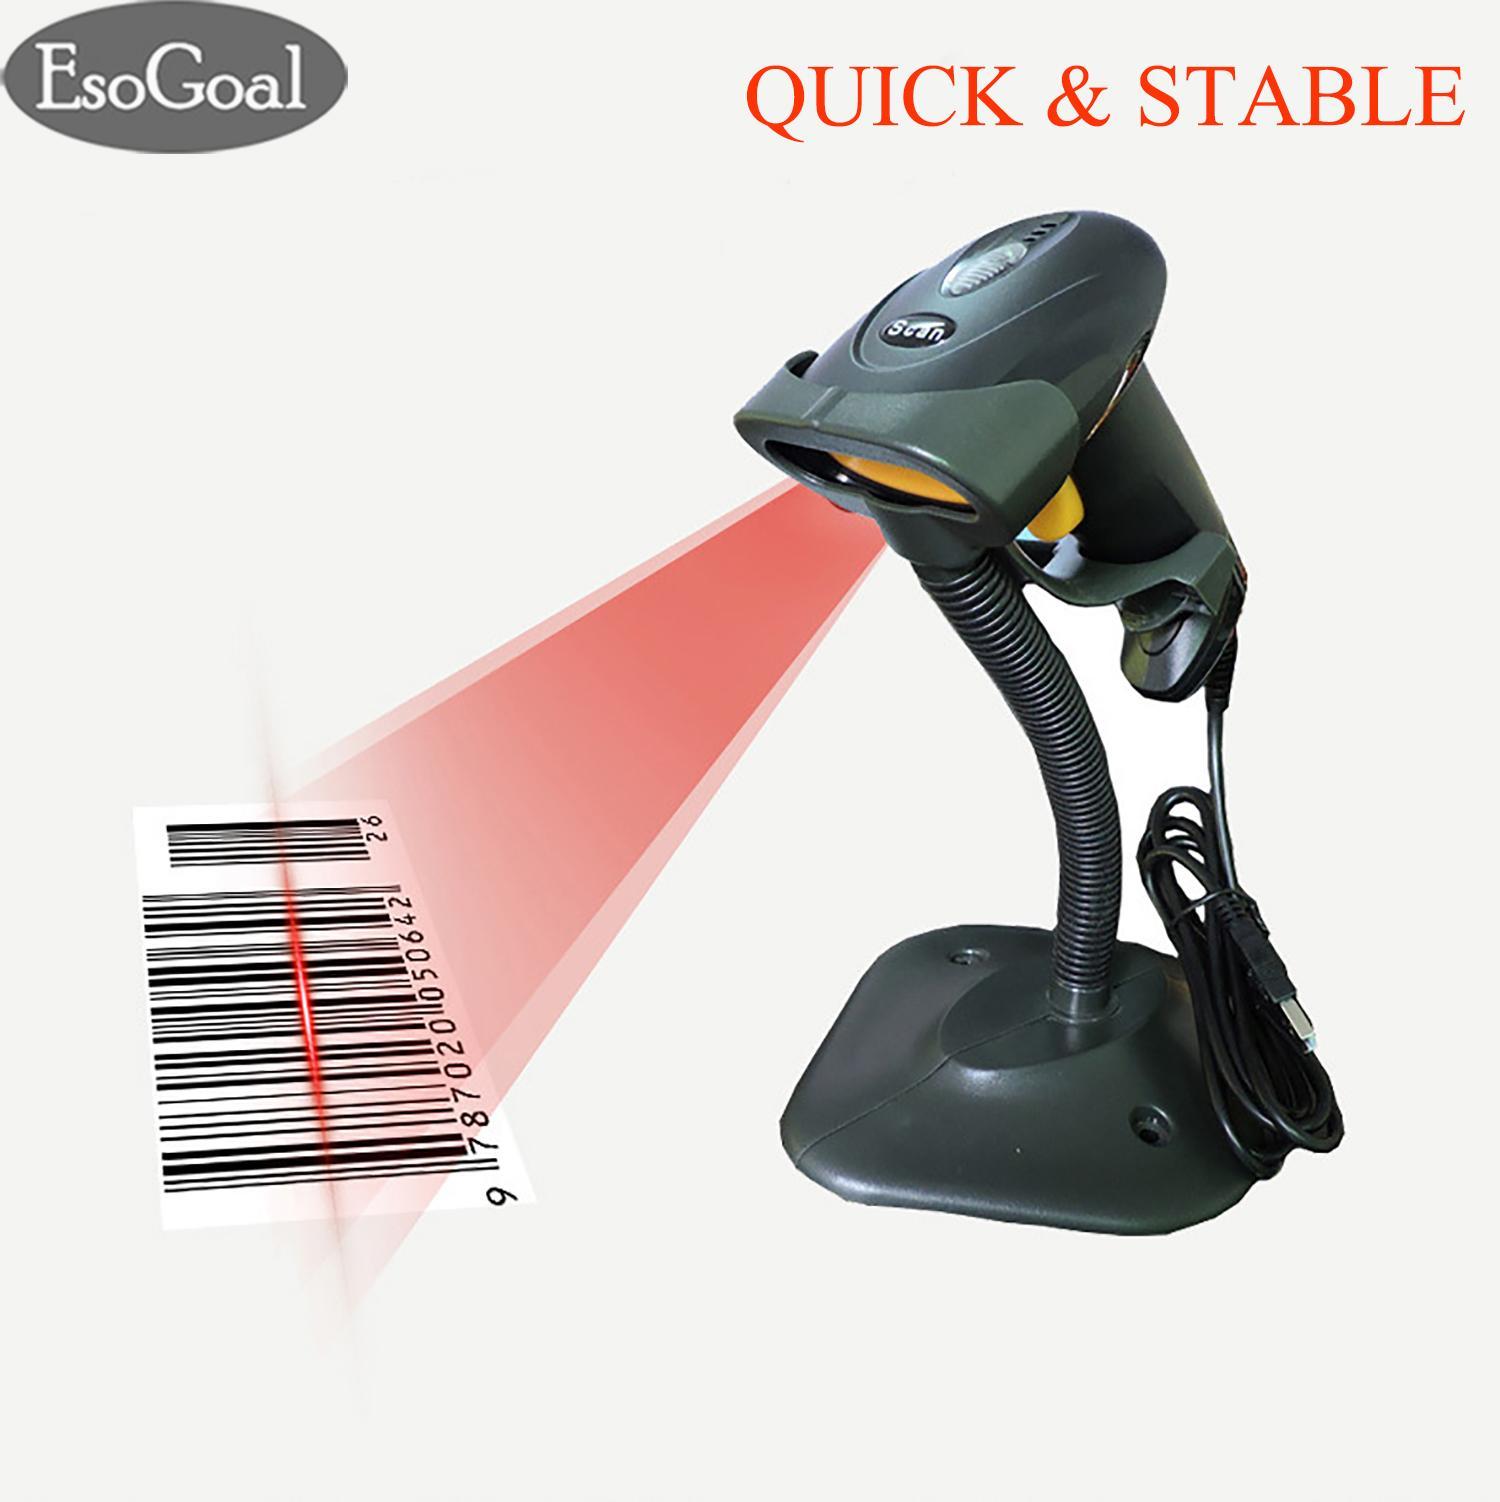 Esogoal Barcode Scanner Usb Wired Barcode Reader Scanner Handheld High Speed Laser Bar Code Scanner 1d With Stand Holder For Window Pc By Esogoal.